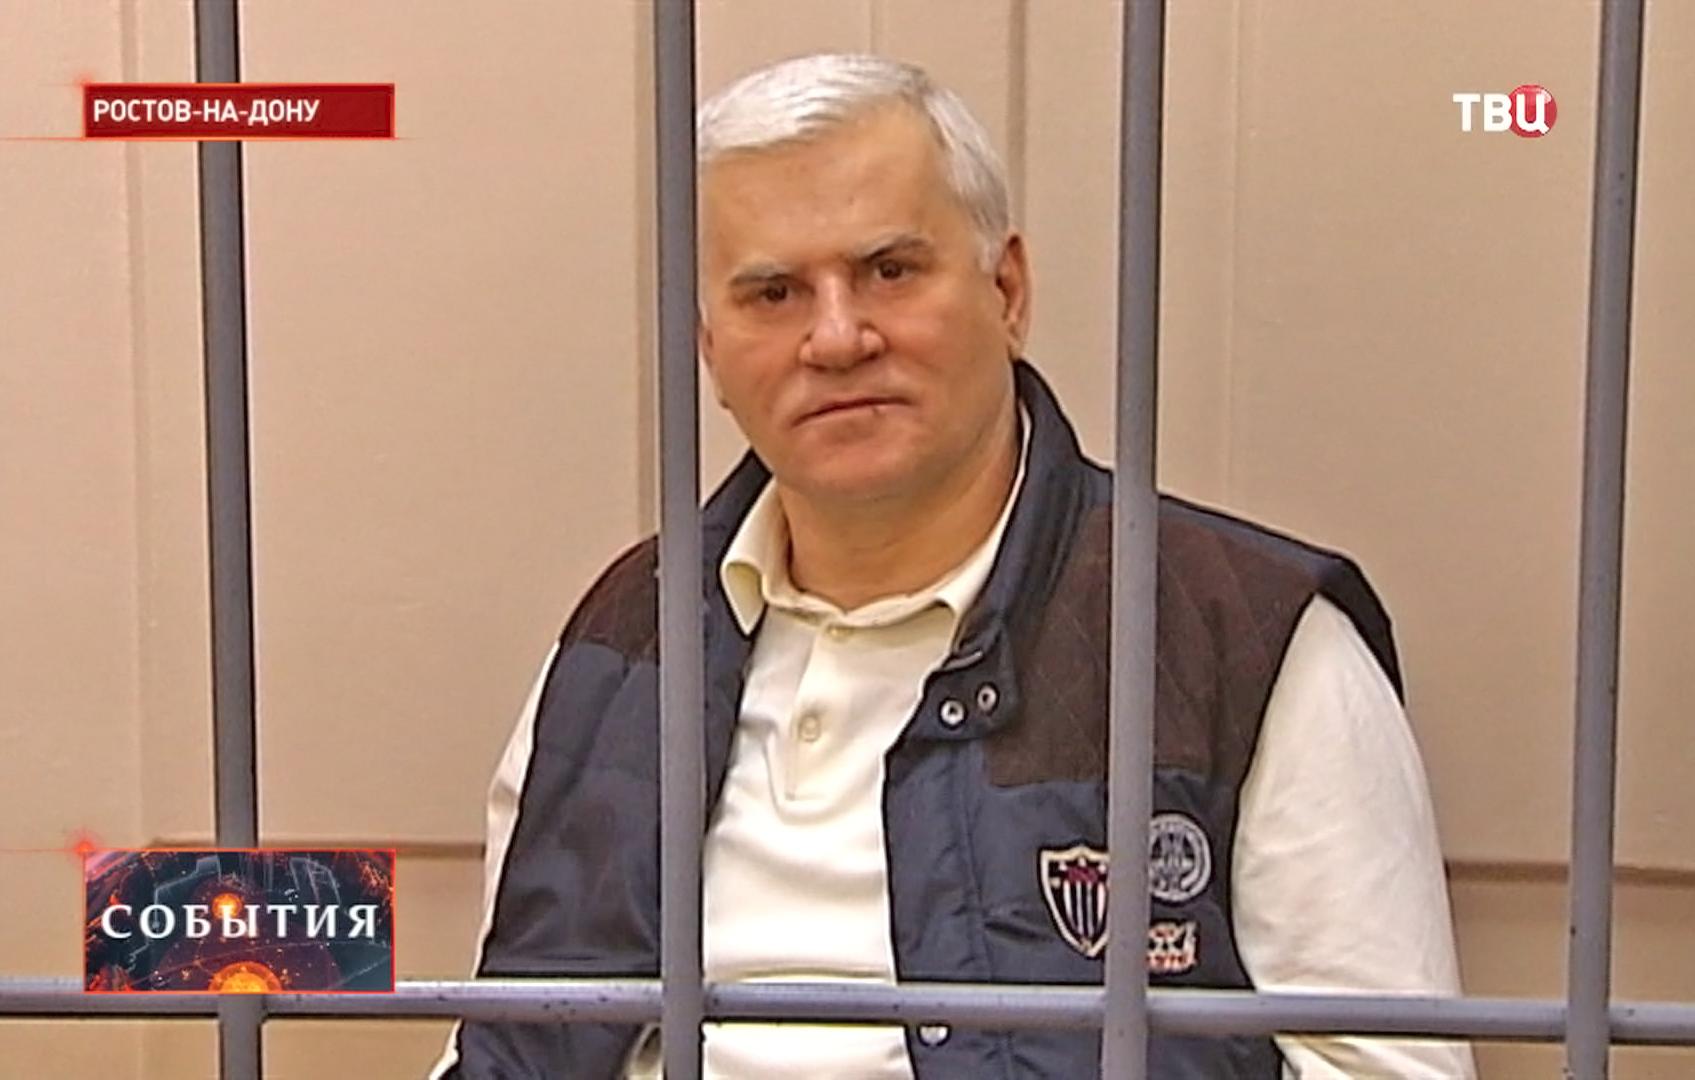 Последние новости луганска видео и фото